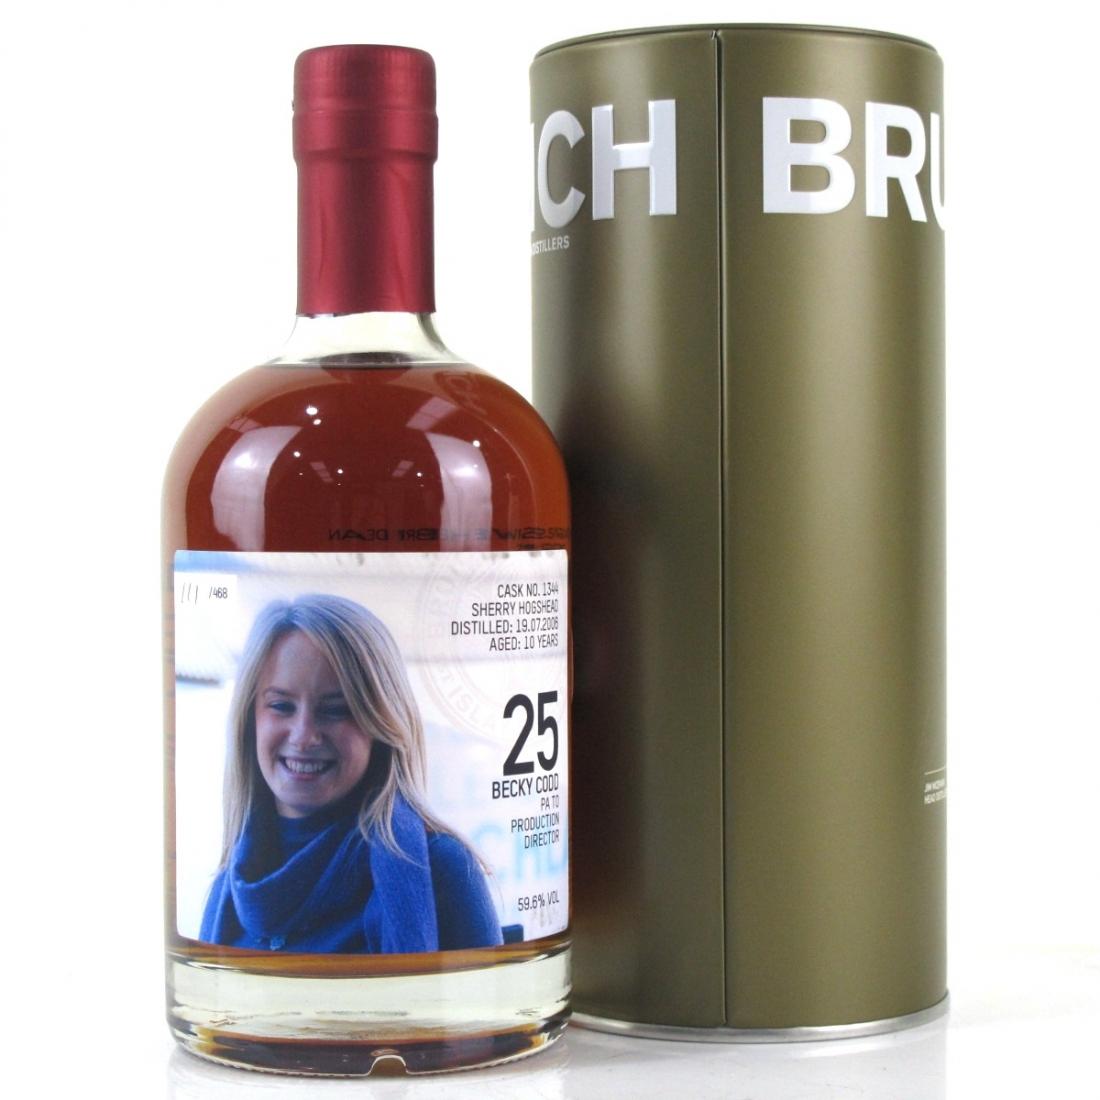 Bruichladdich 2006 Becky Codd Valinch 10 Year Old #1344